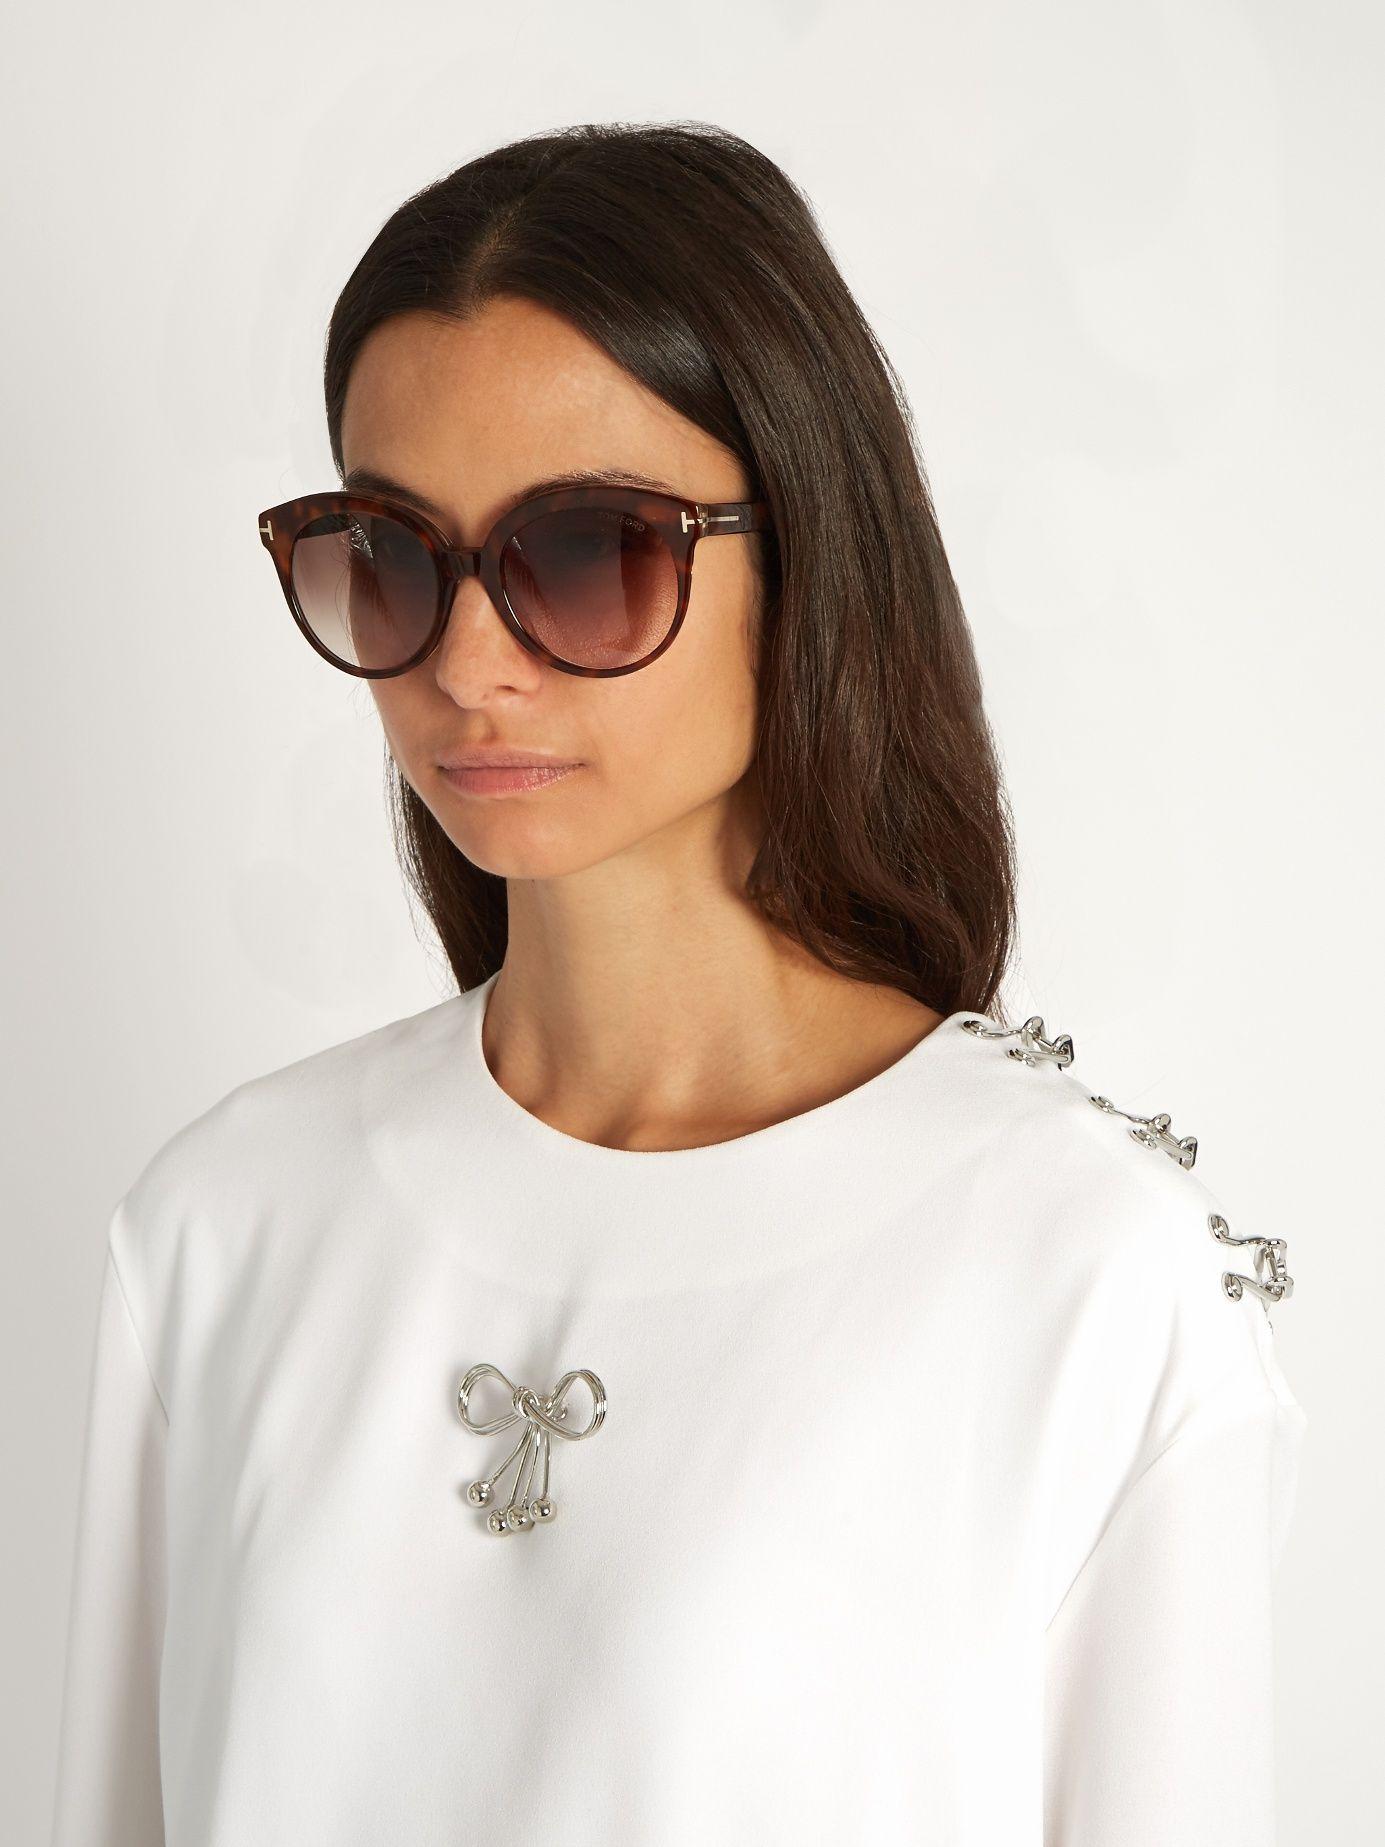 027677d25d0 Monica acetate sunglasses